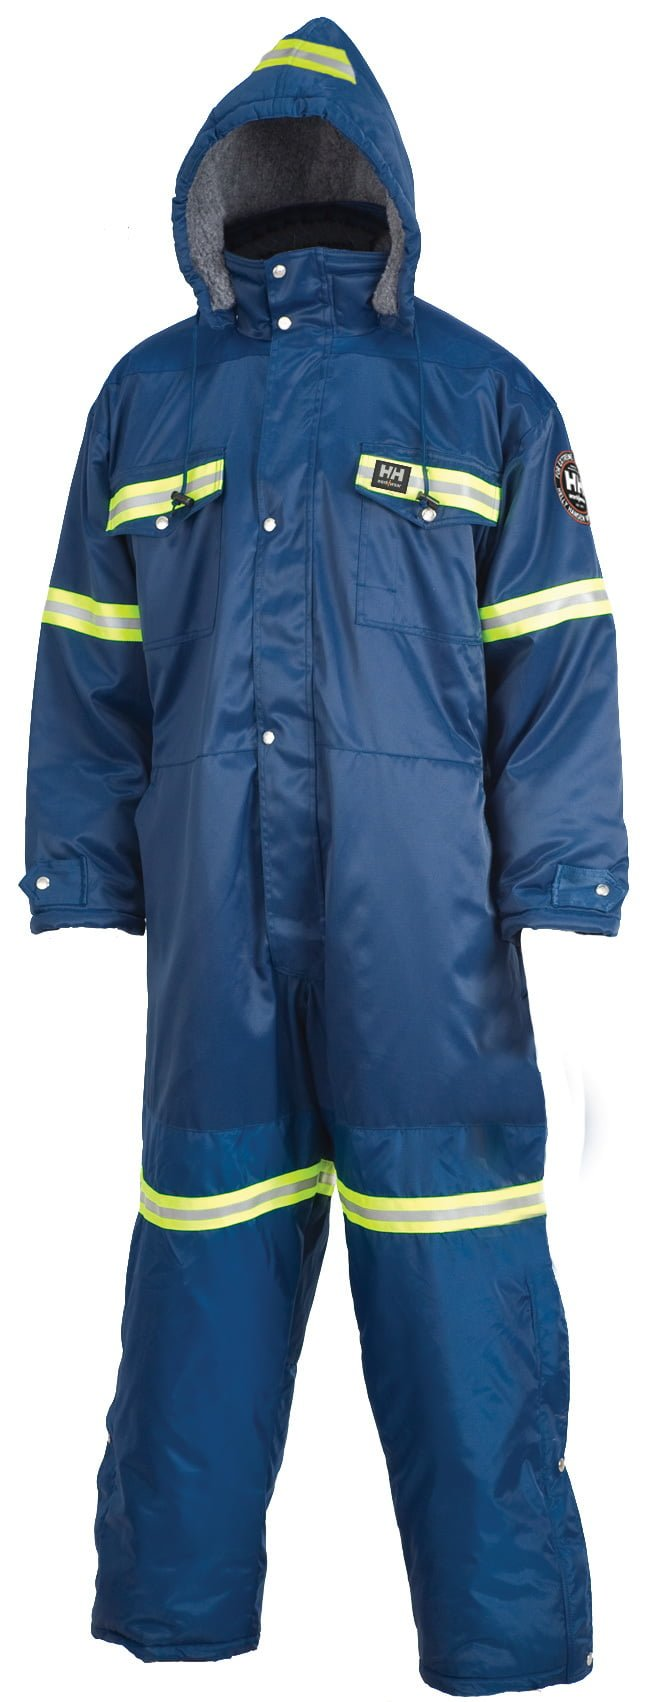 Thomson Reflective Snow Suit Helly Hansen 76612